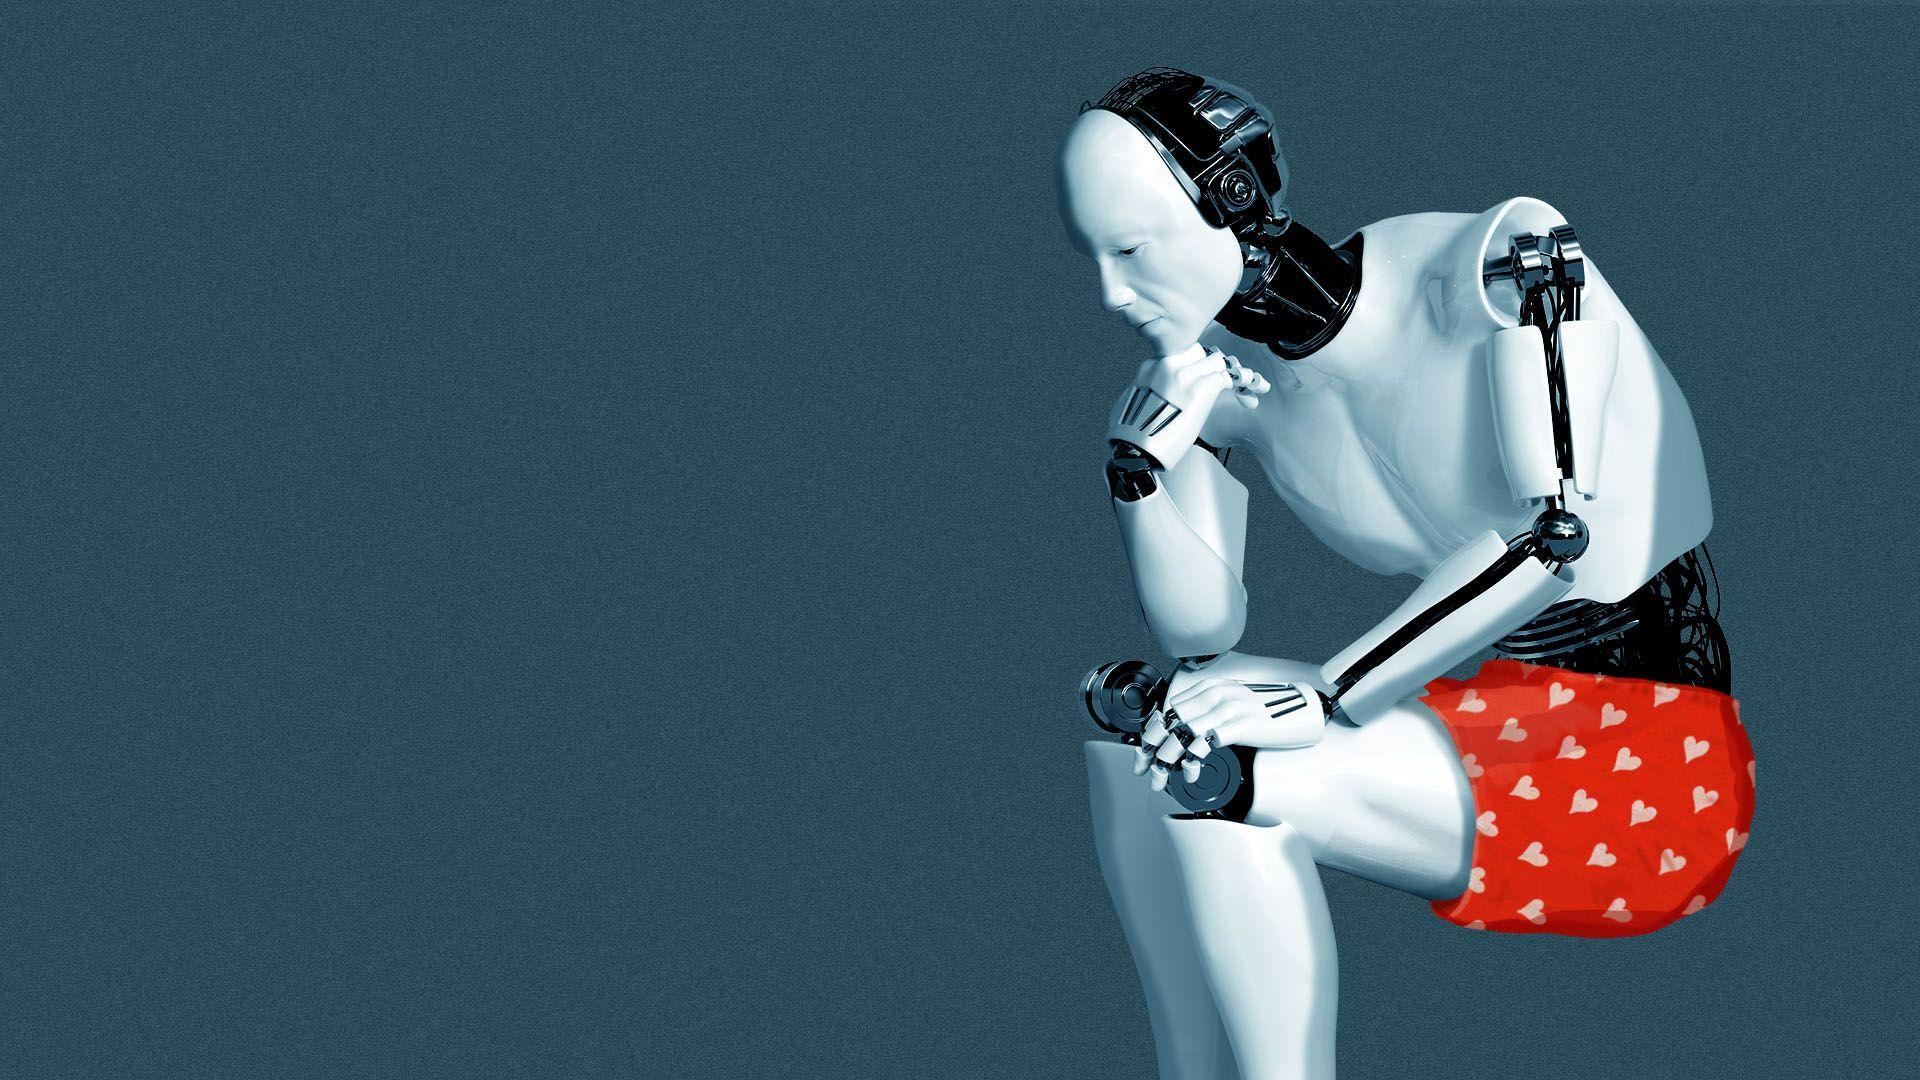 A reality check for AI hubris